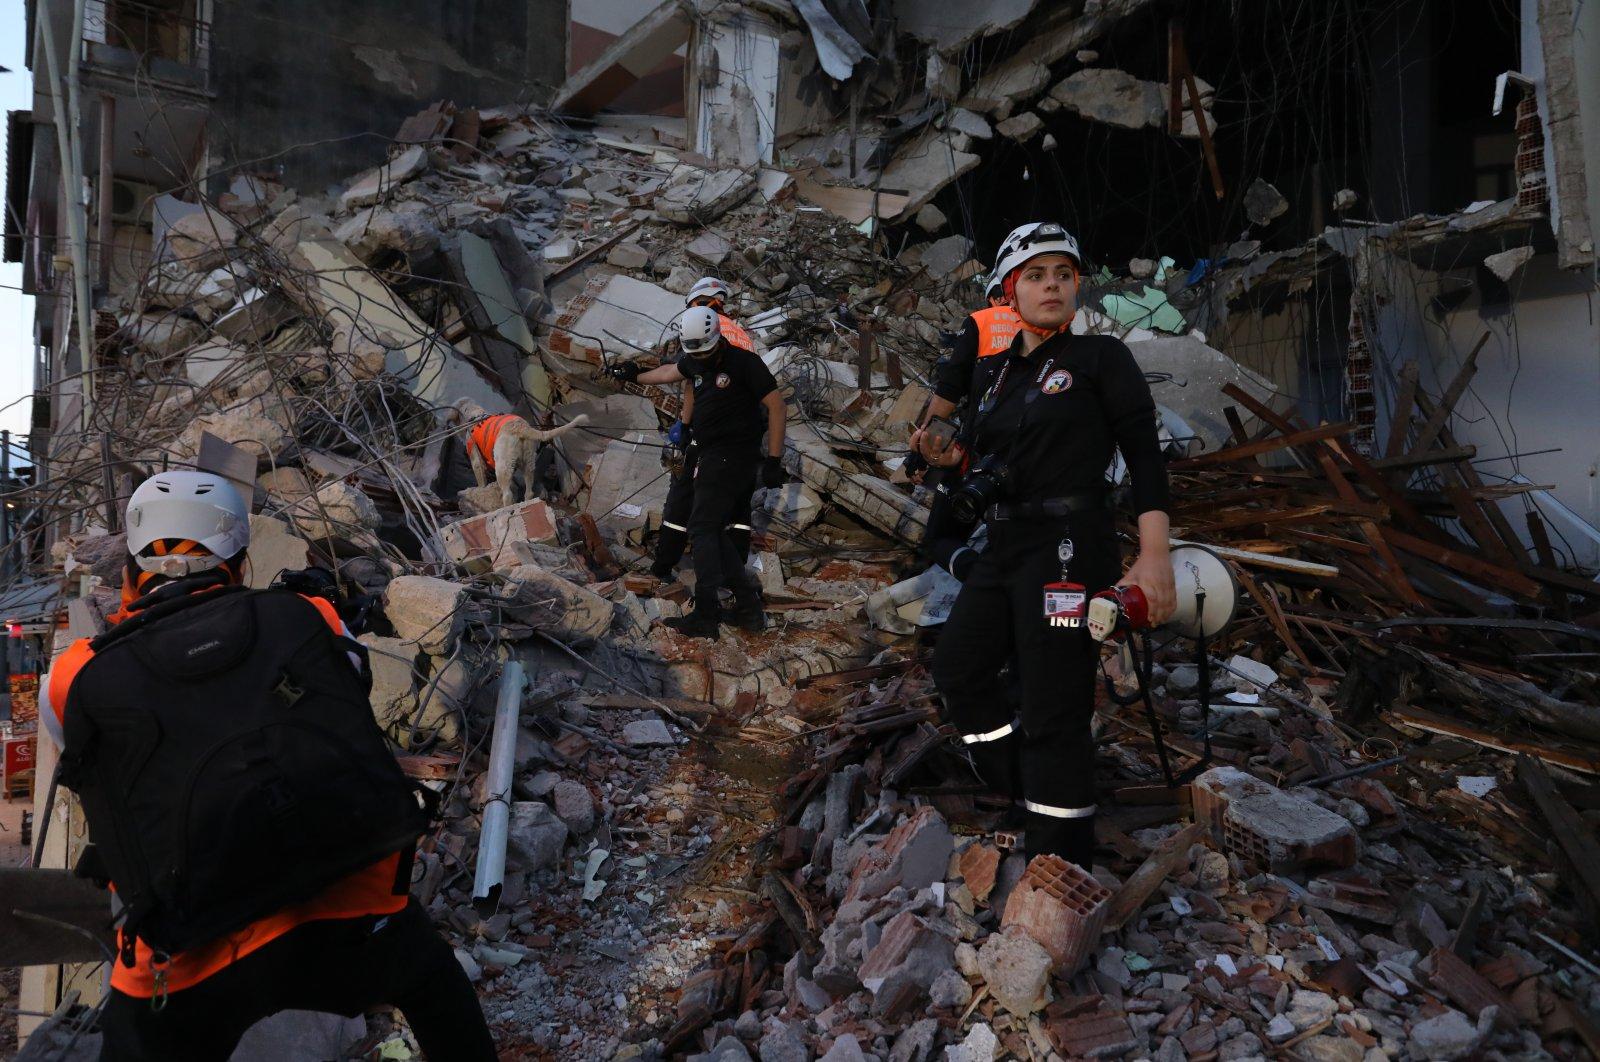 Crews attend an earthquake preparedness drill in a demolished building, in Bursa, northwestern Turkey, Aug. 13, 2021. (AA PHOTO)